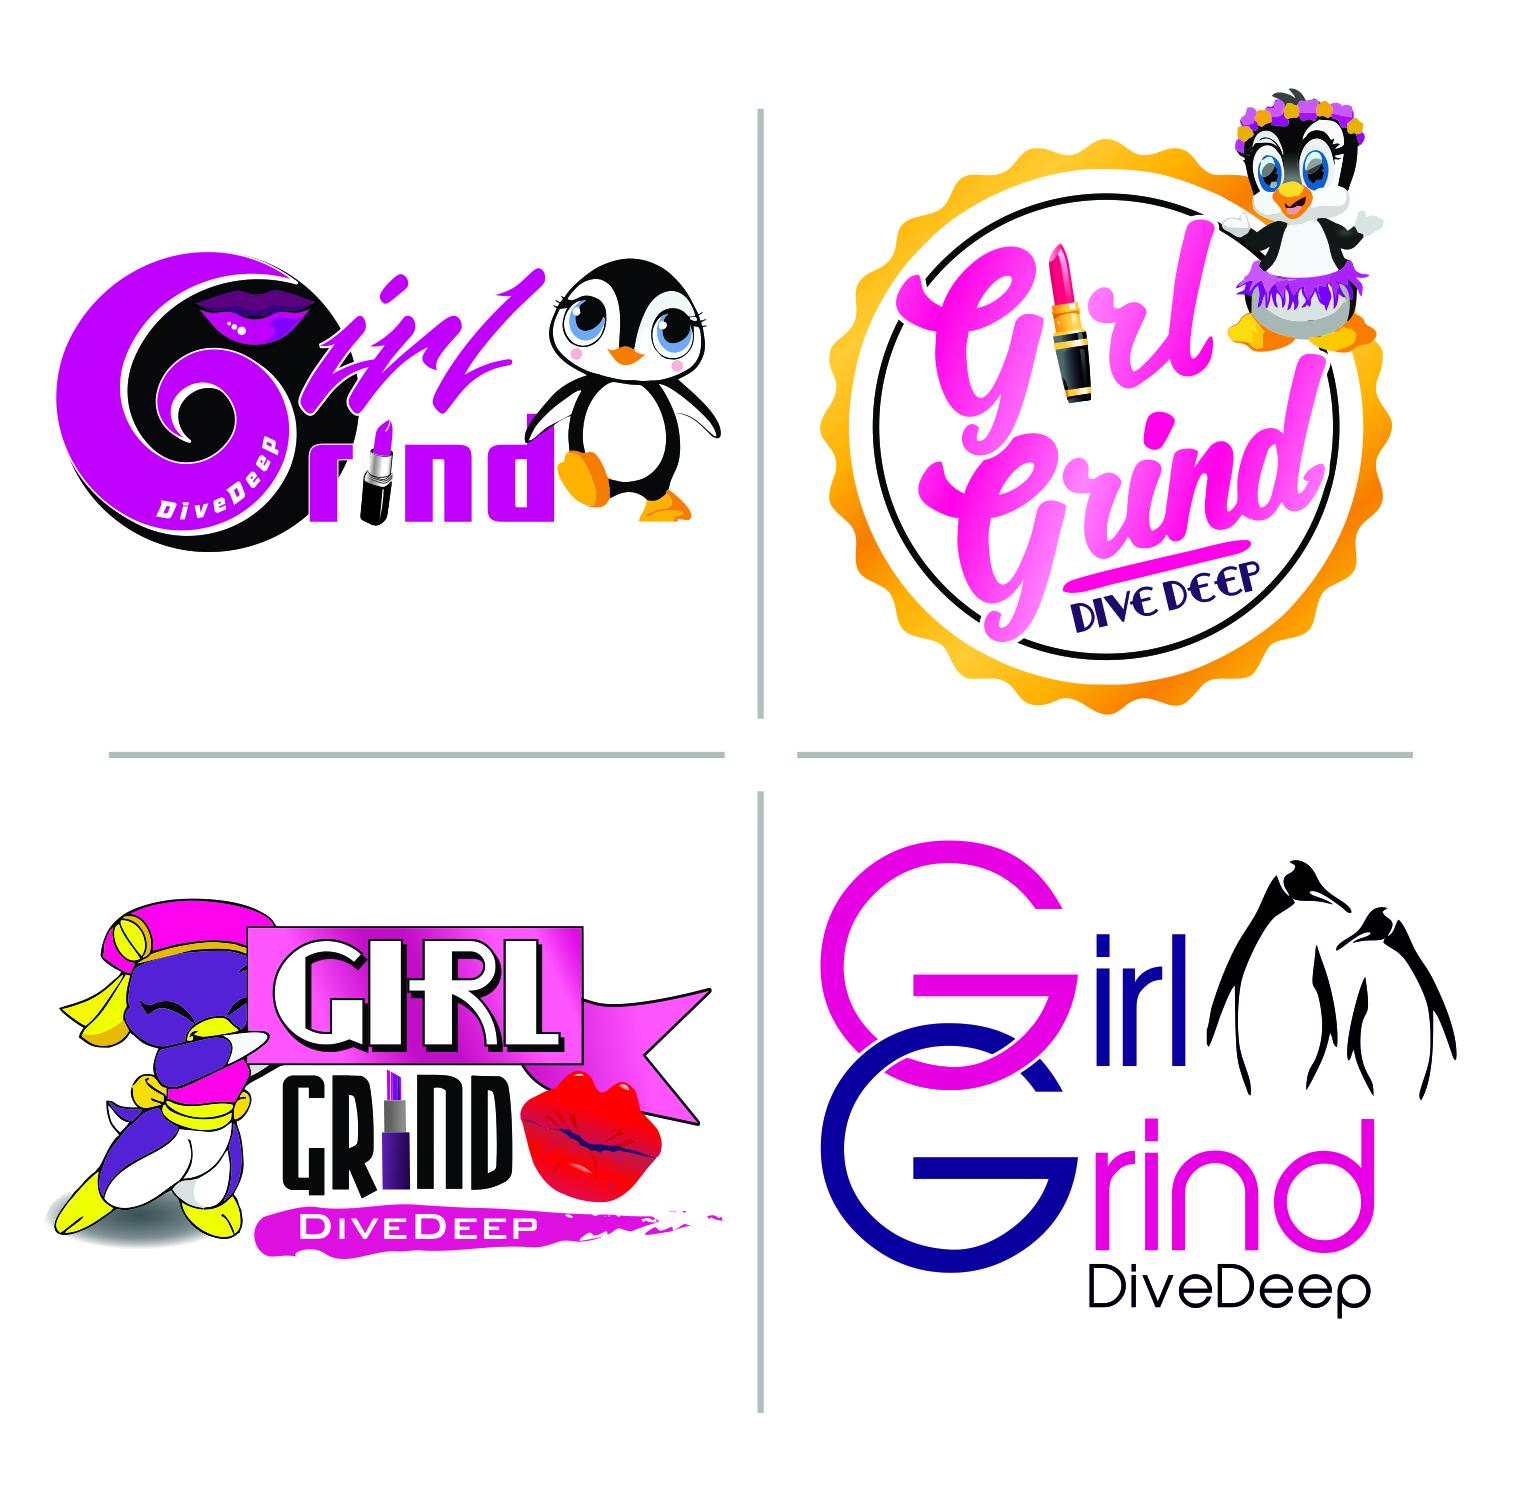 GIRL GRIND logos